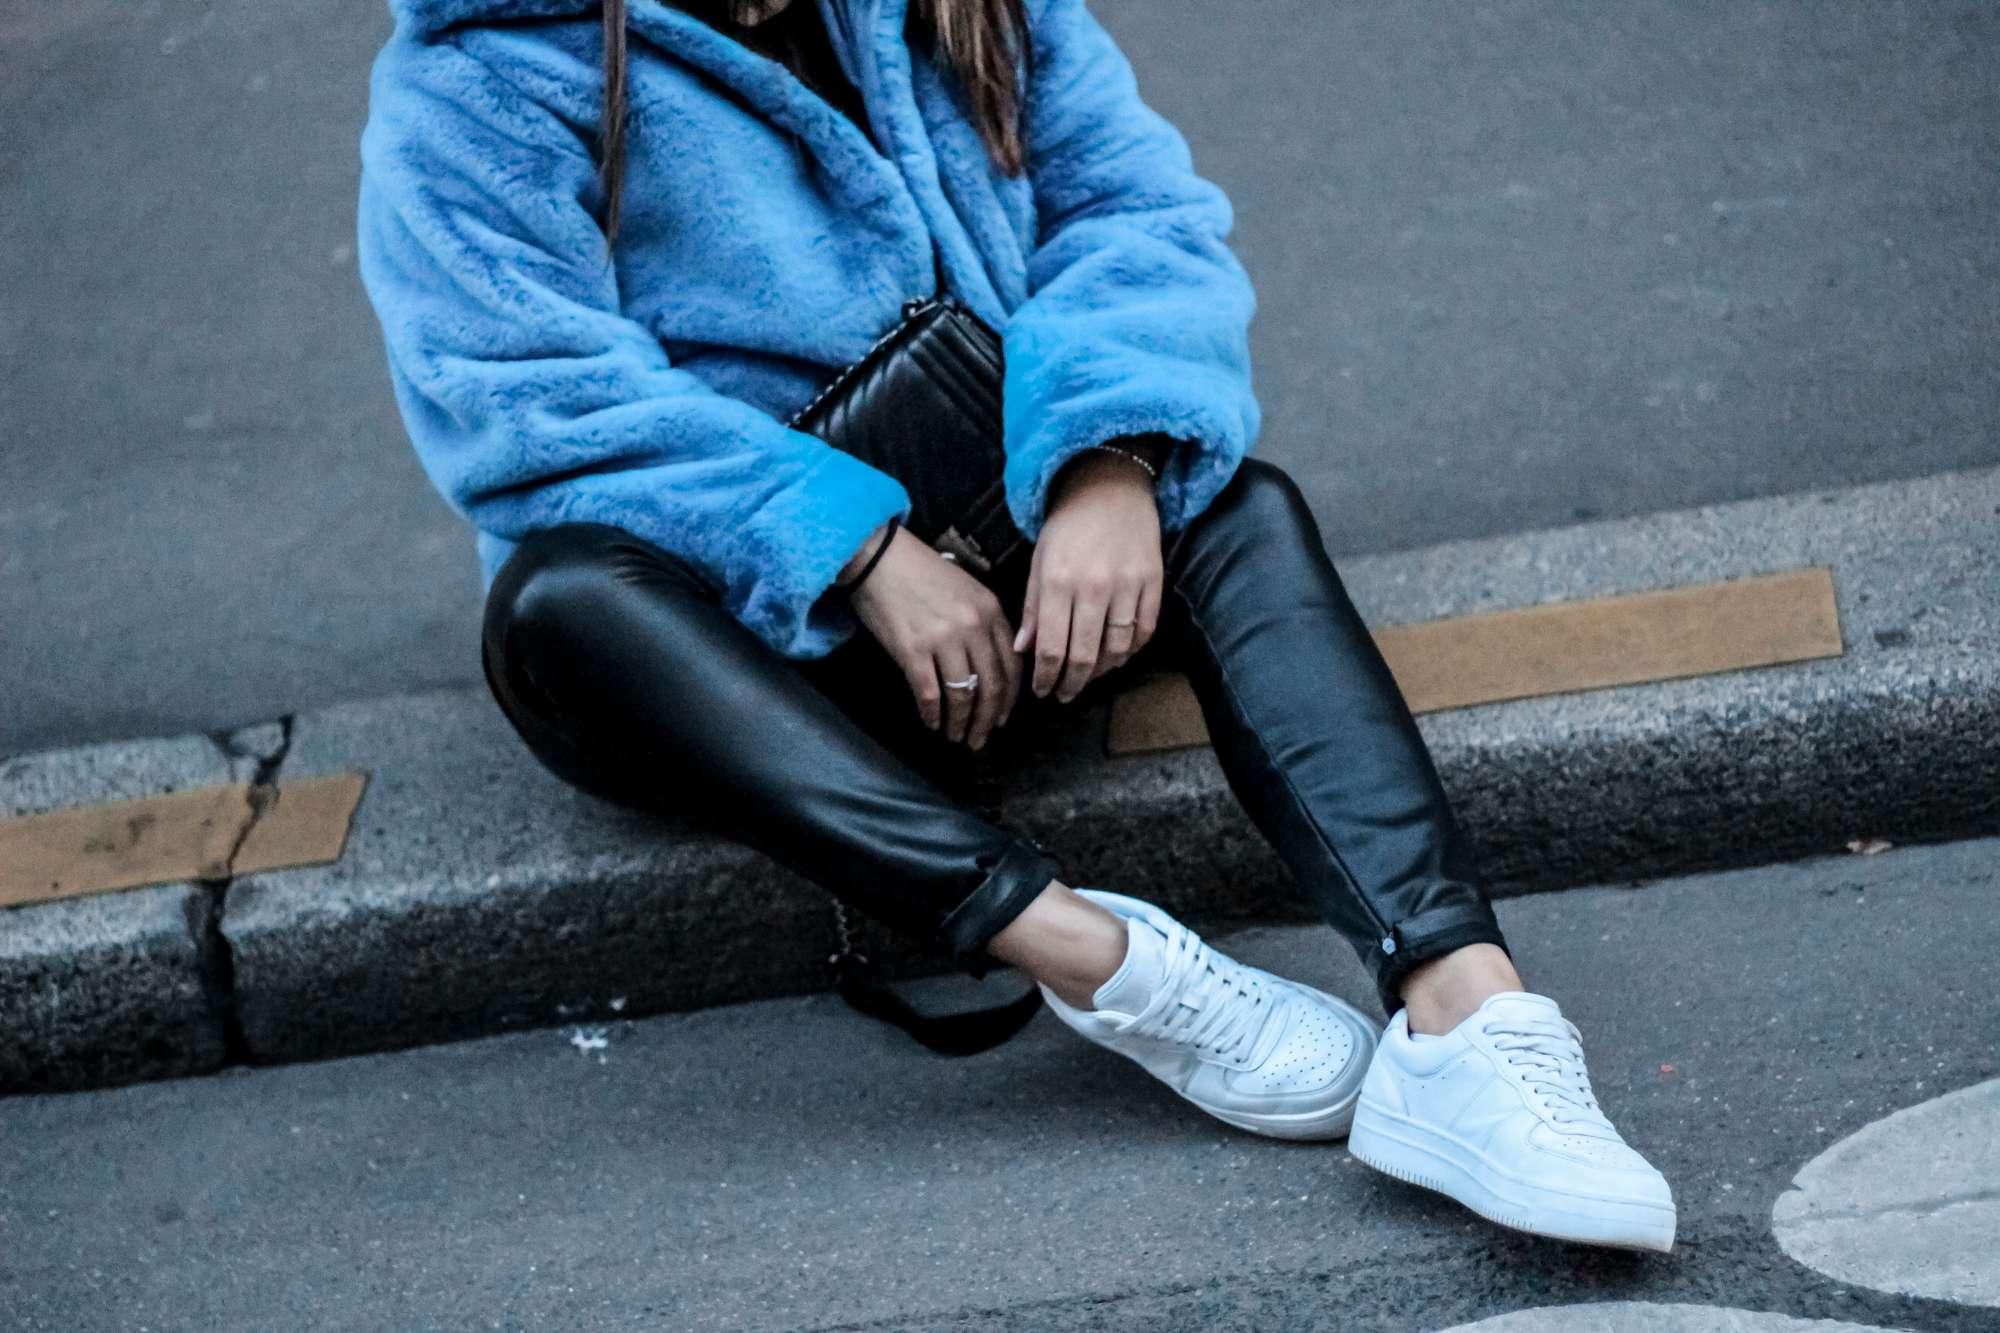 the green ananas, blog mode, h&m, manteau bleu, manteau bleu h&m, faux fur, manteau fausse fourrure, no leather, vogue, t shirt vogue, shein, pantalon simili cuir, blogueuse mode, pinterest, perfect coat by h&m